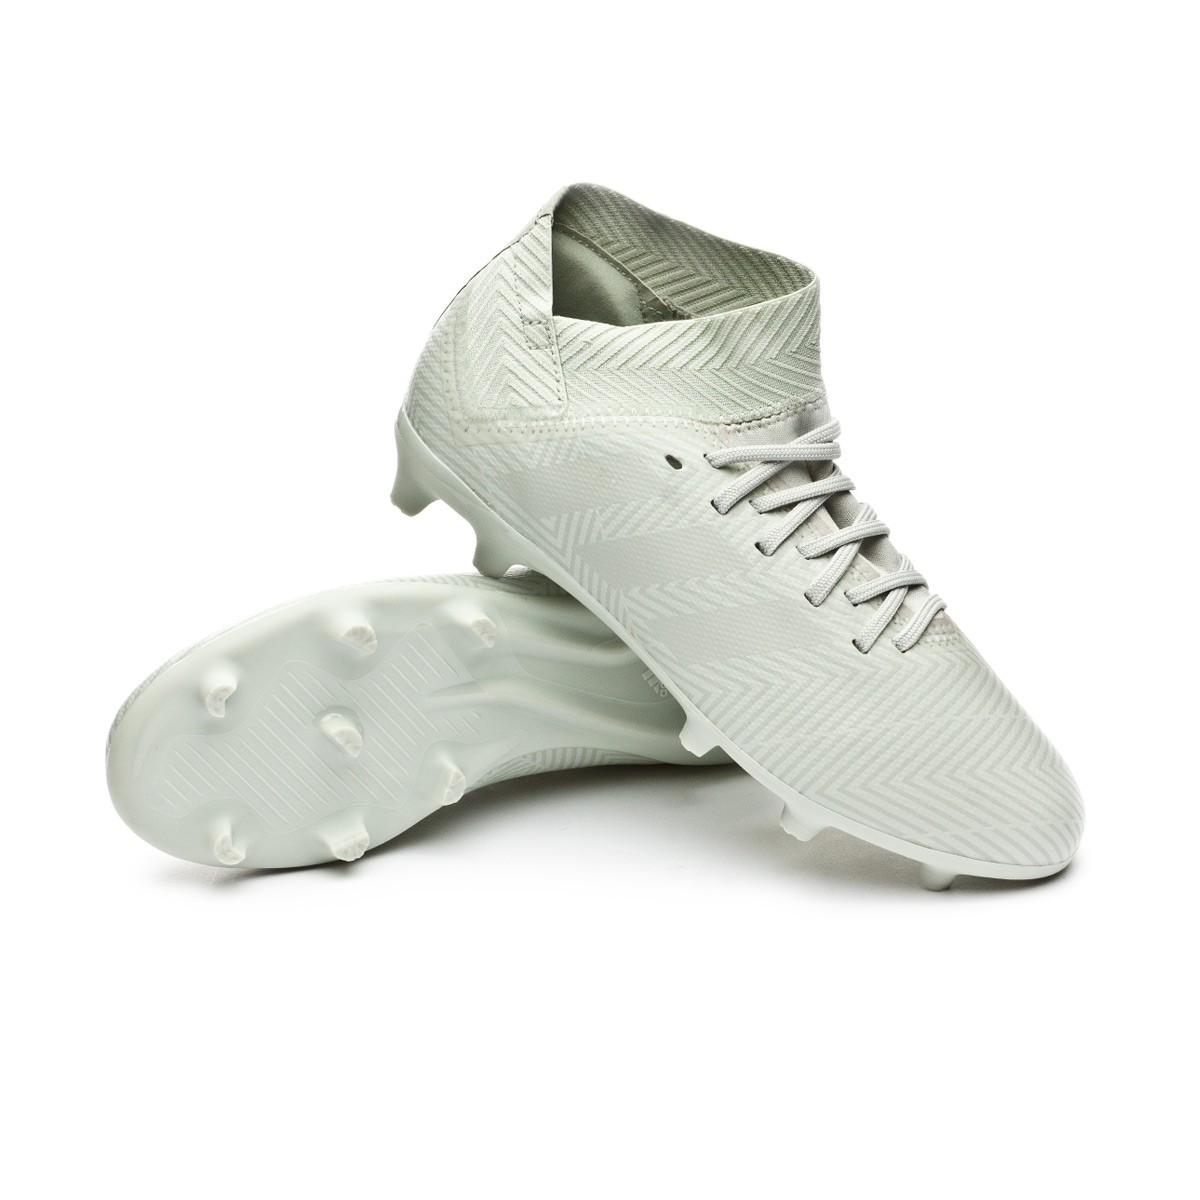 0418c39db Boot adidas Kids Nemeziz 18.3 FG Ash silver-White tint - Football ...